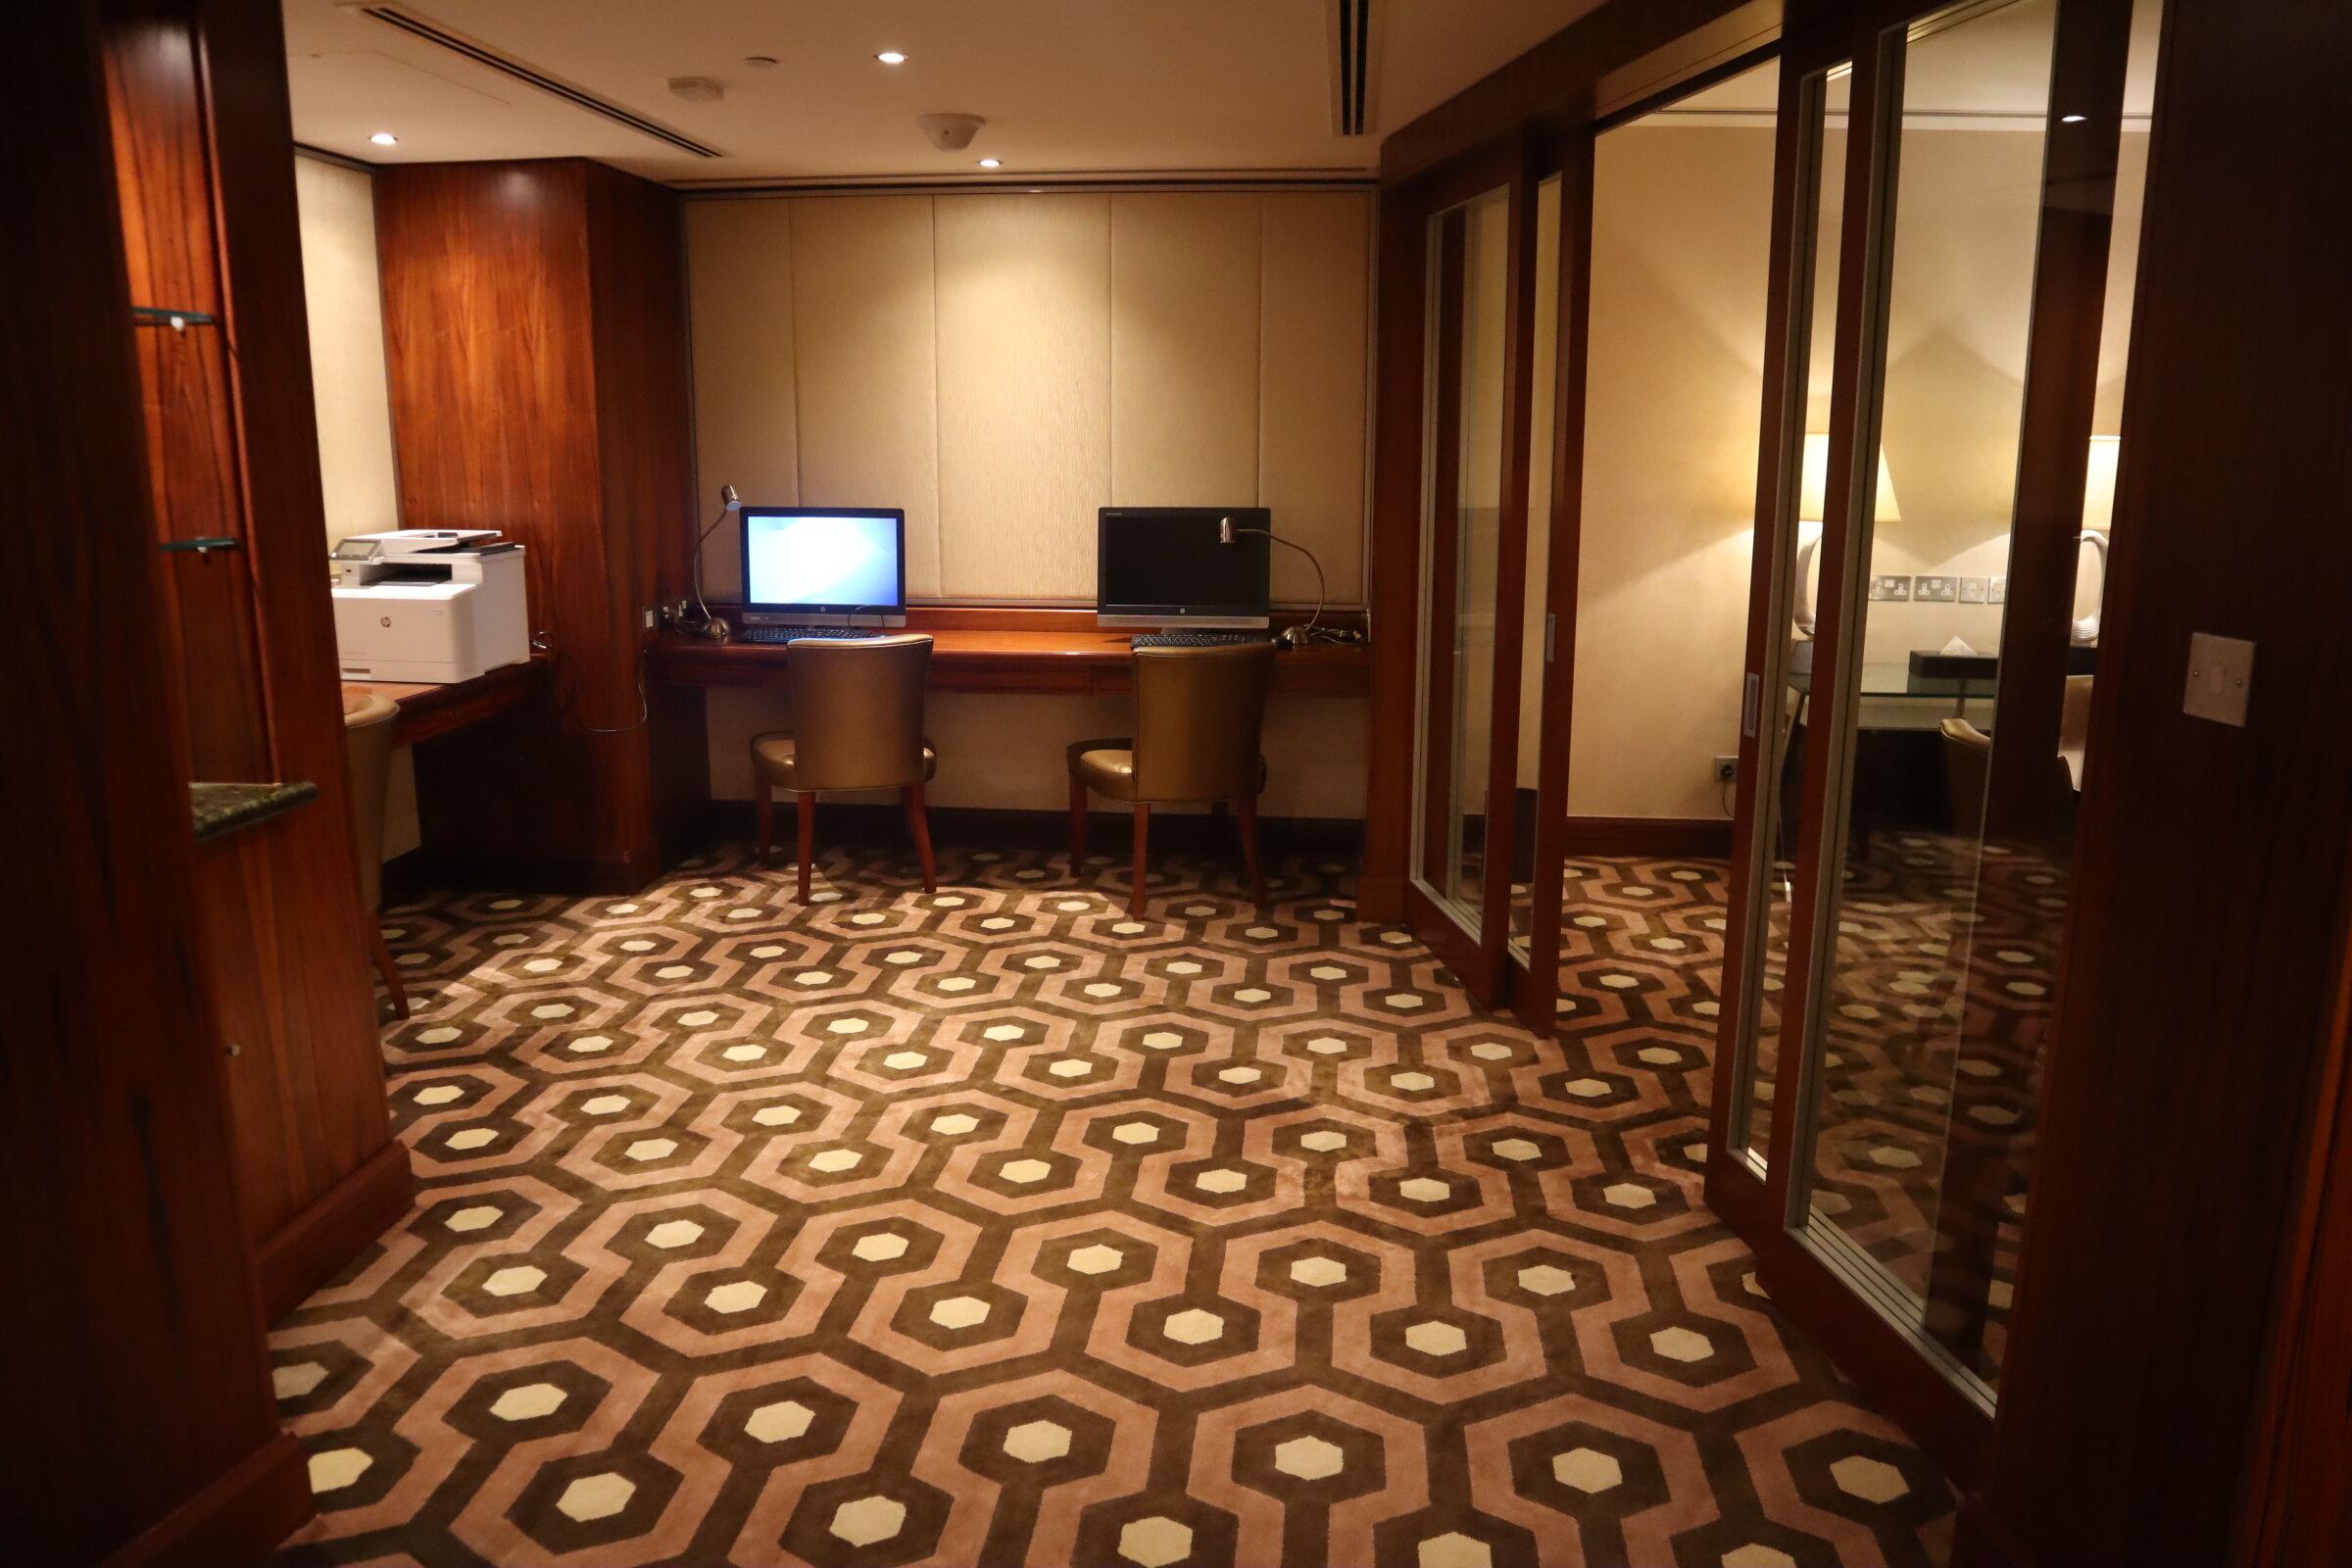 Sheraton Oman – Sheraton Club computer workstations